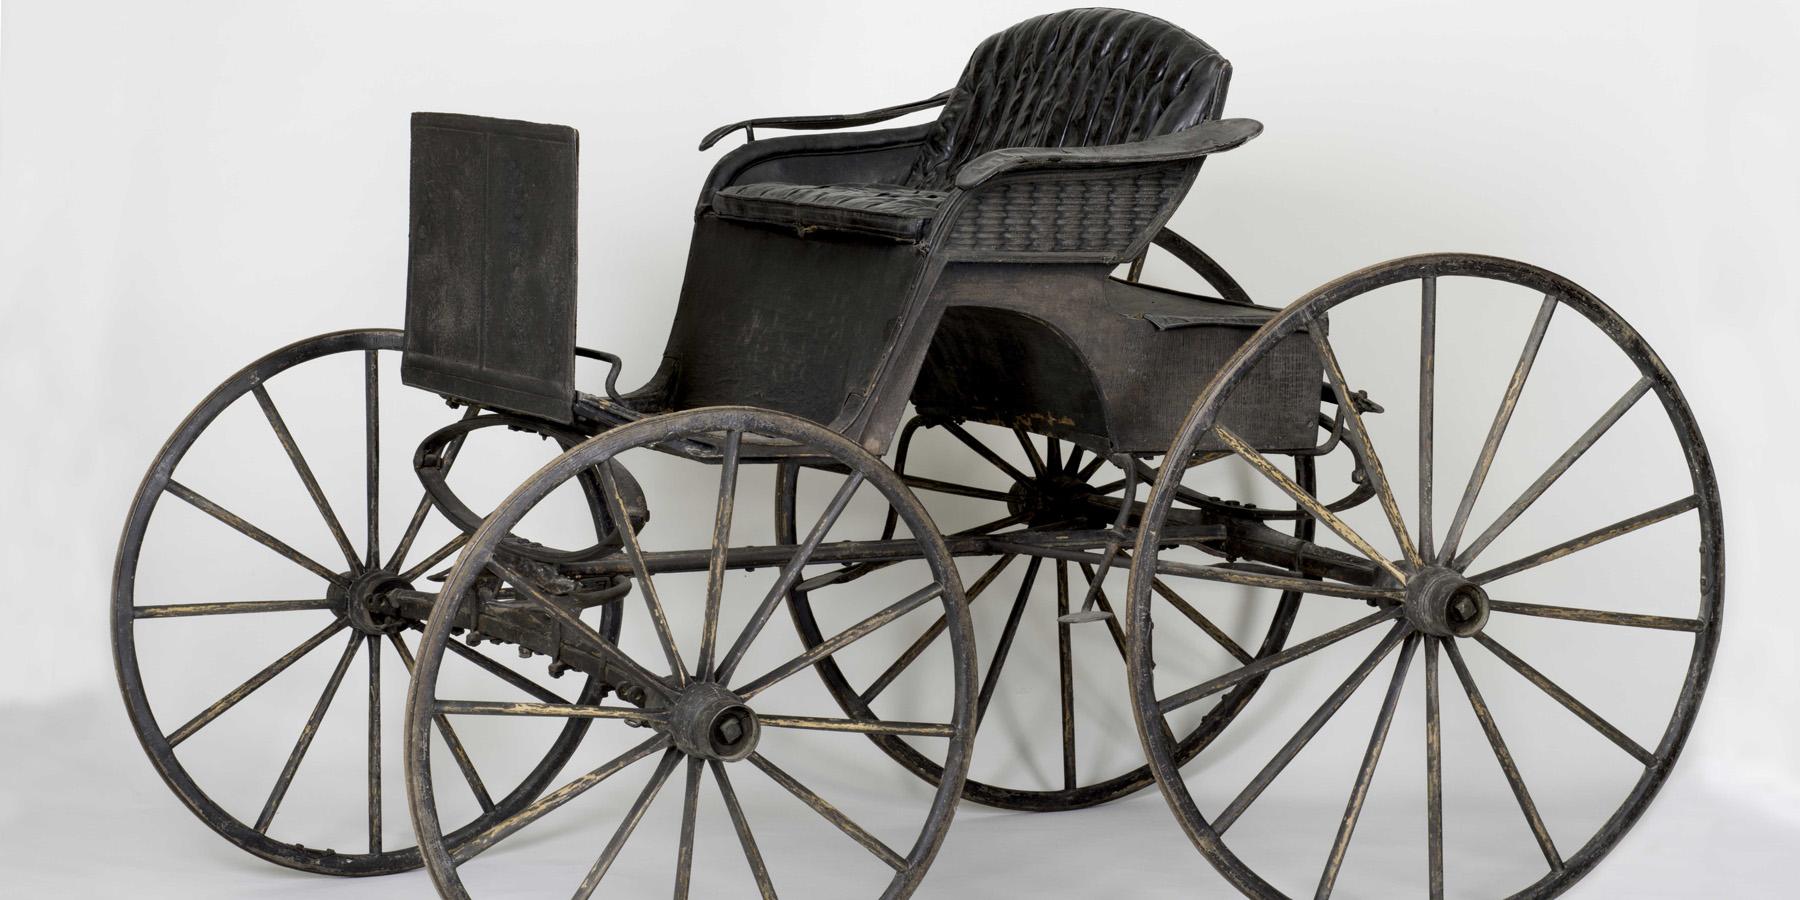 Drawn vehicle vehicle Drawn Vehicles Horse Museum Horse